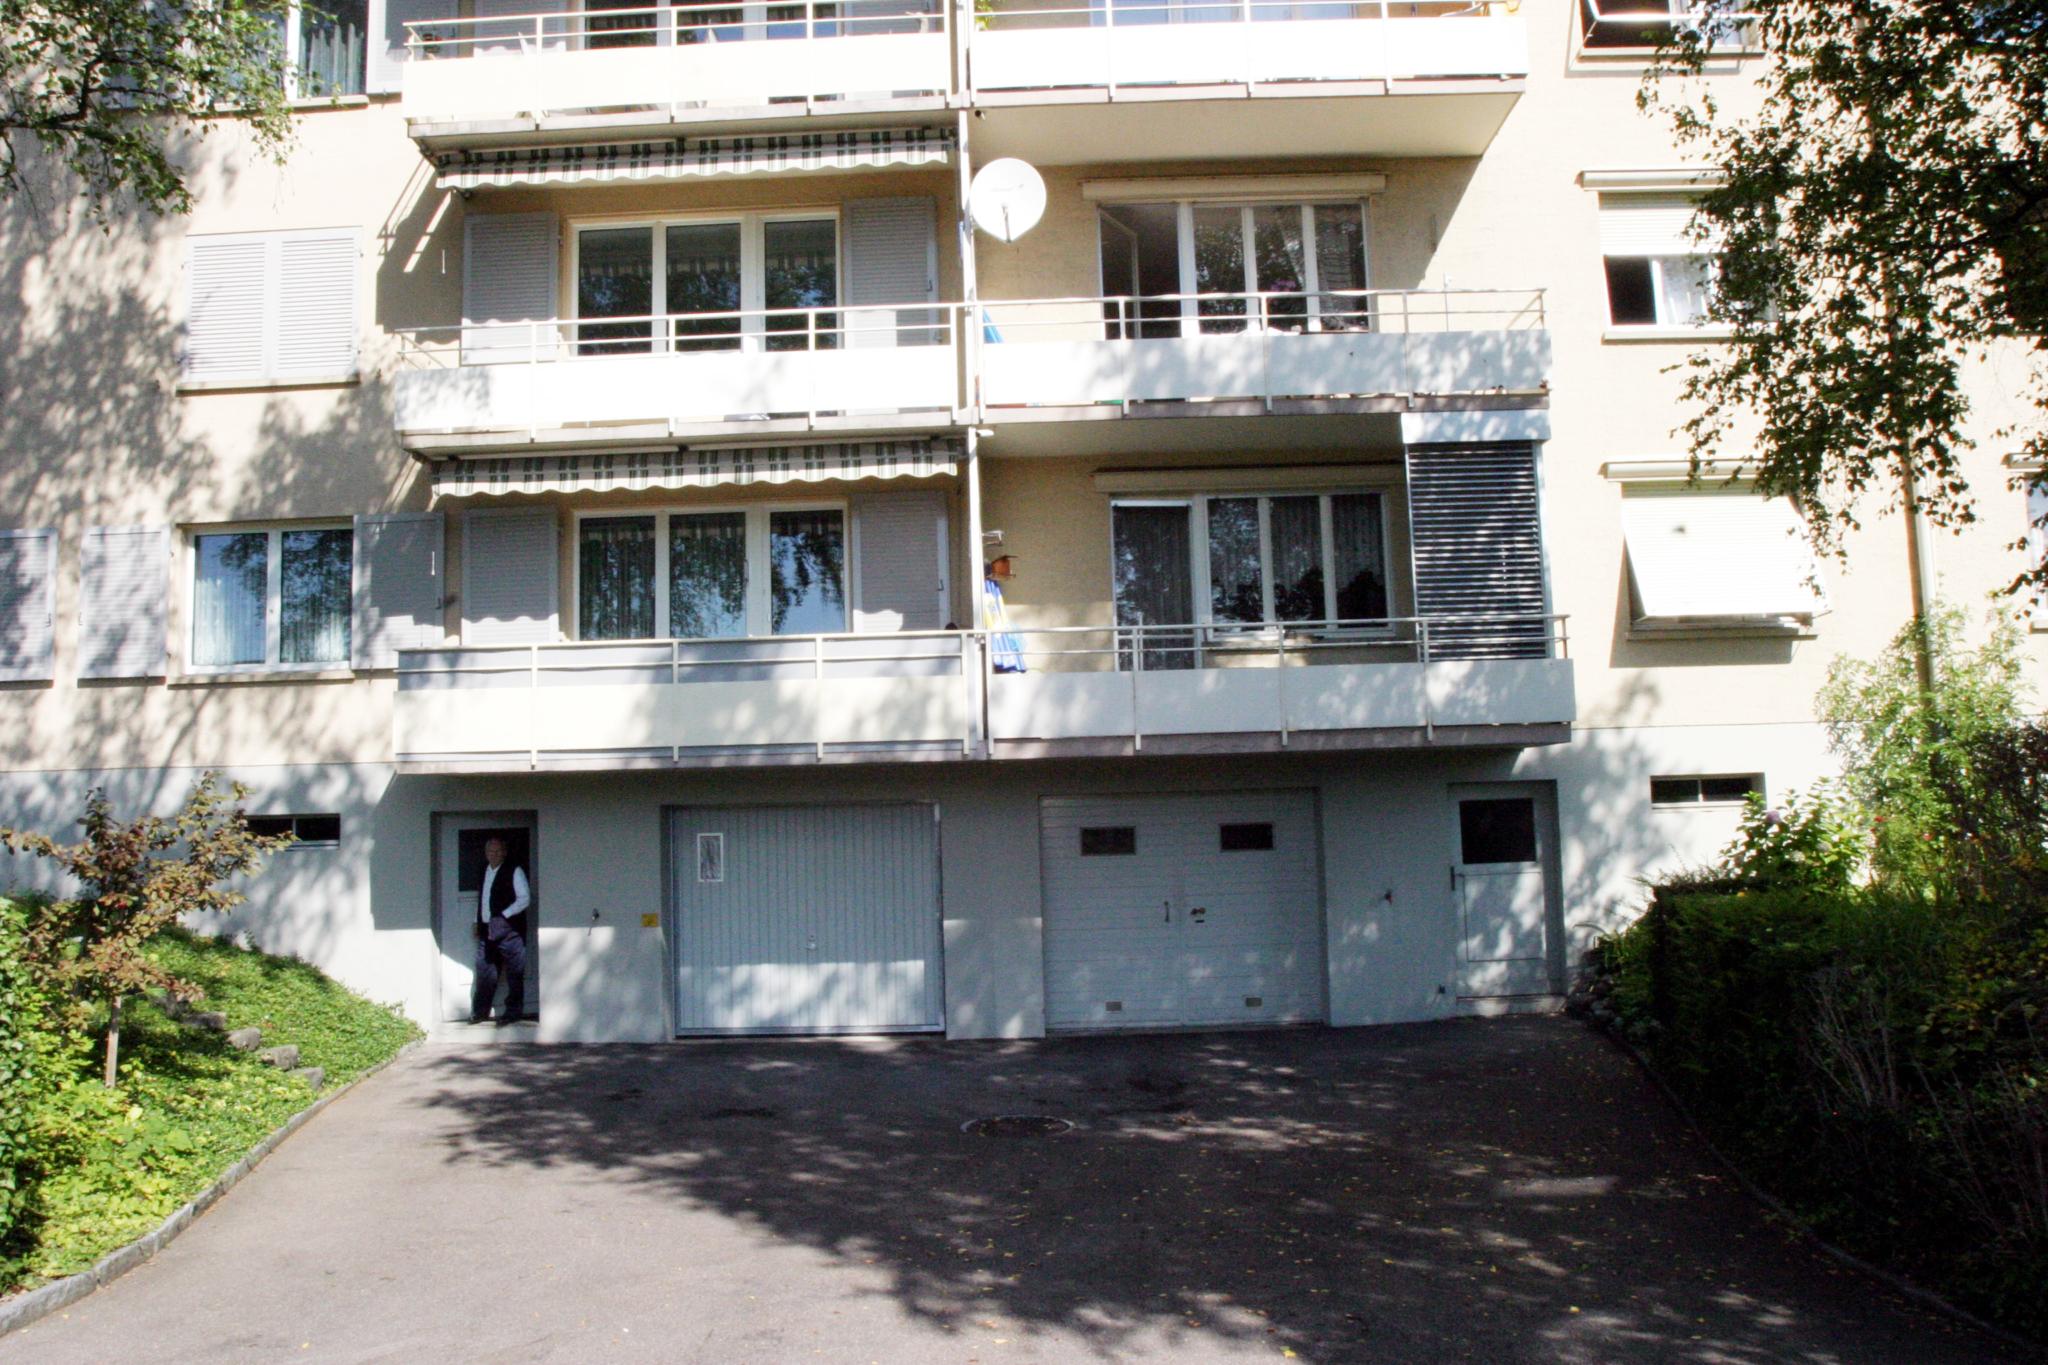 Mehrfamilienhaus in Winterthur